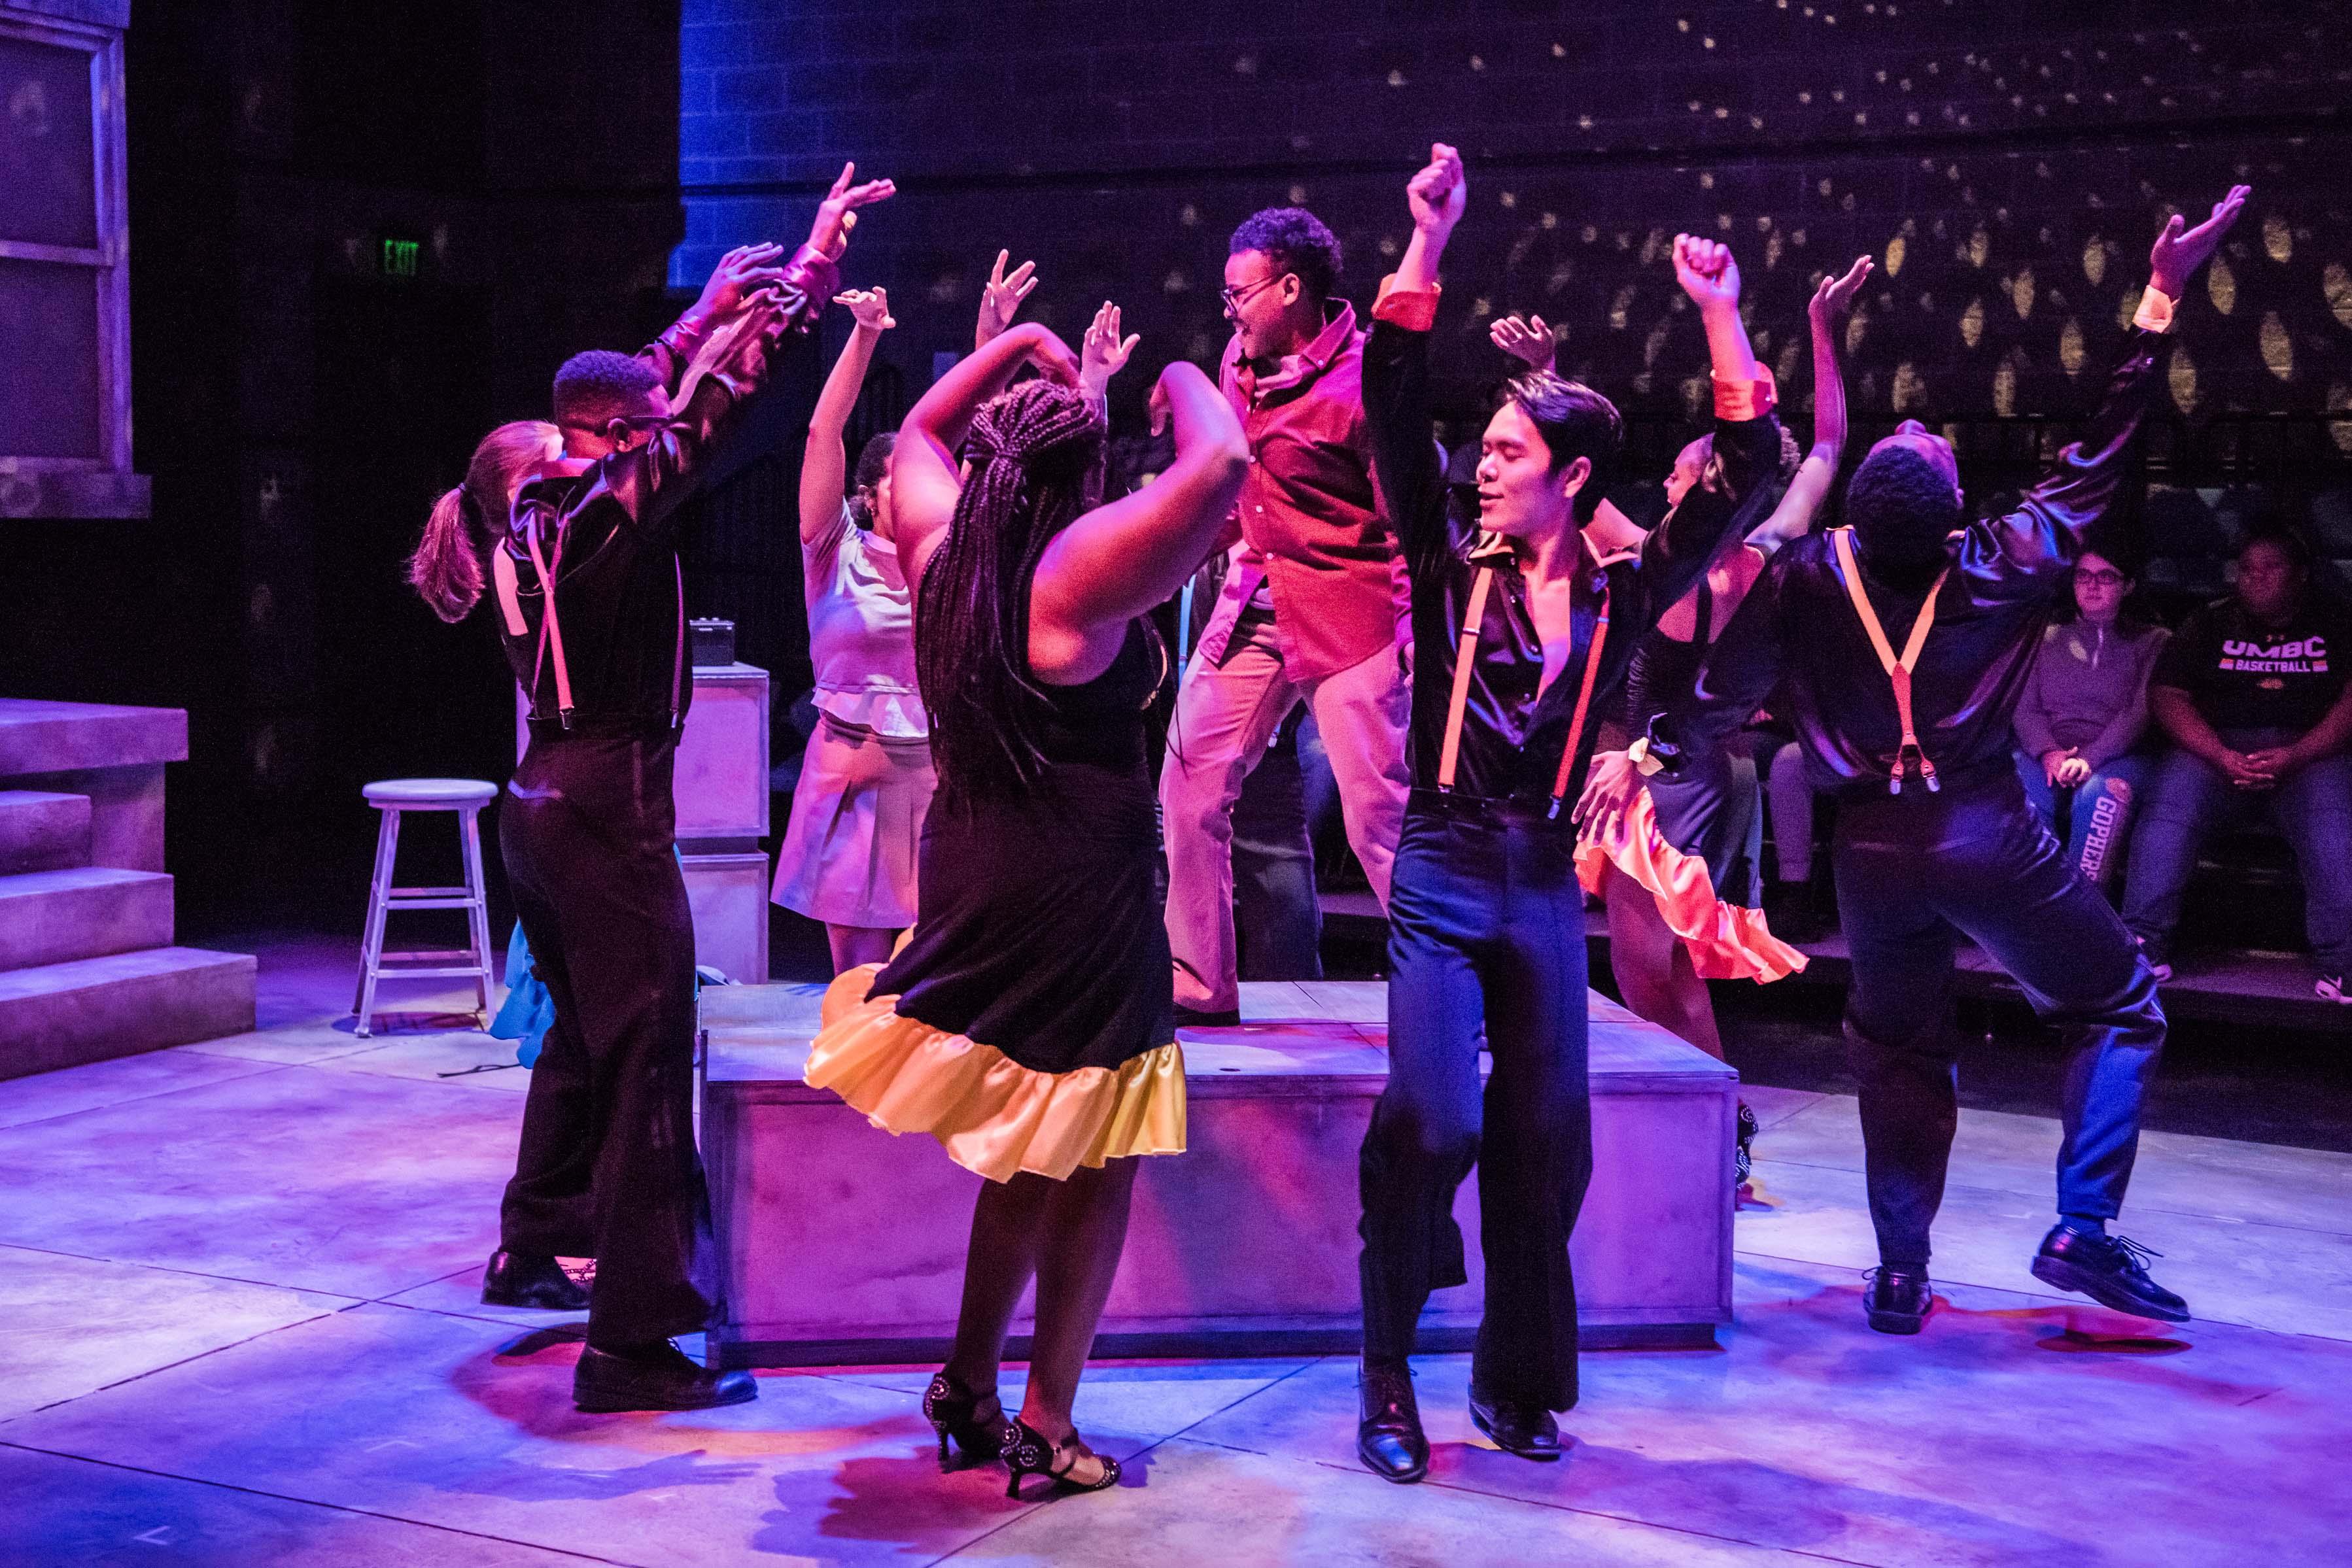 Group dancing around girl on platform at rehearsal